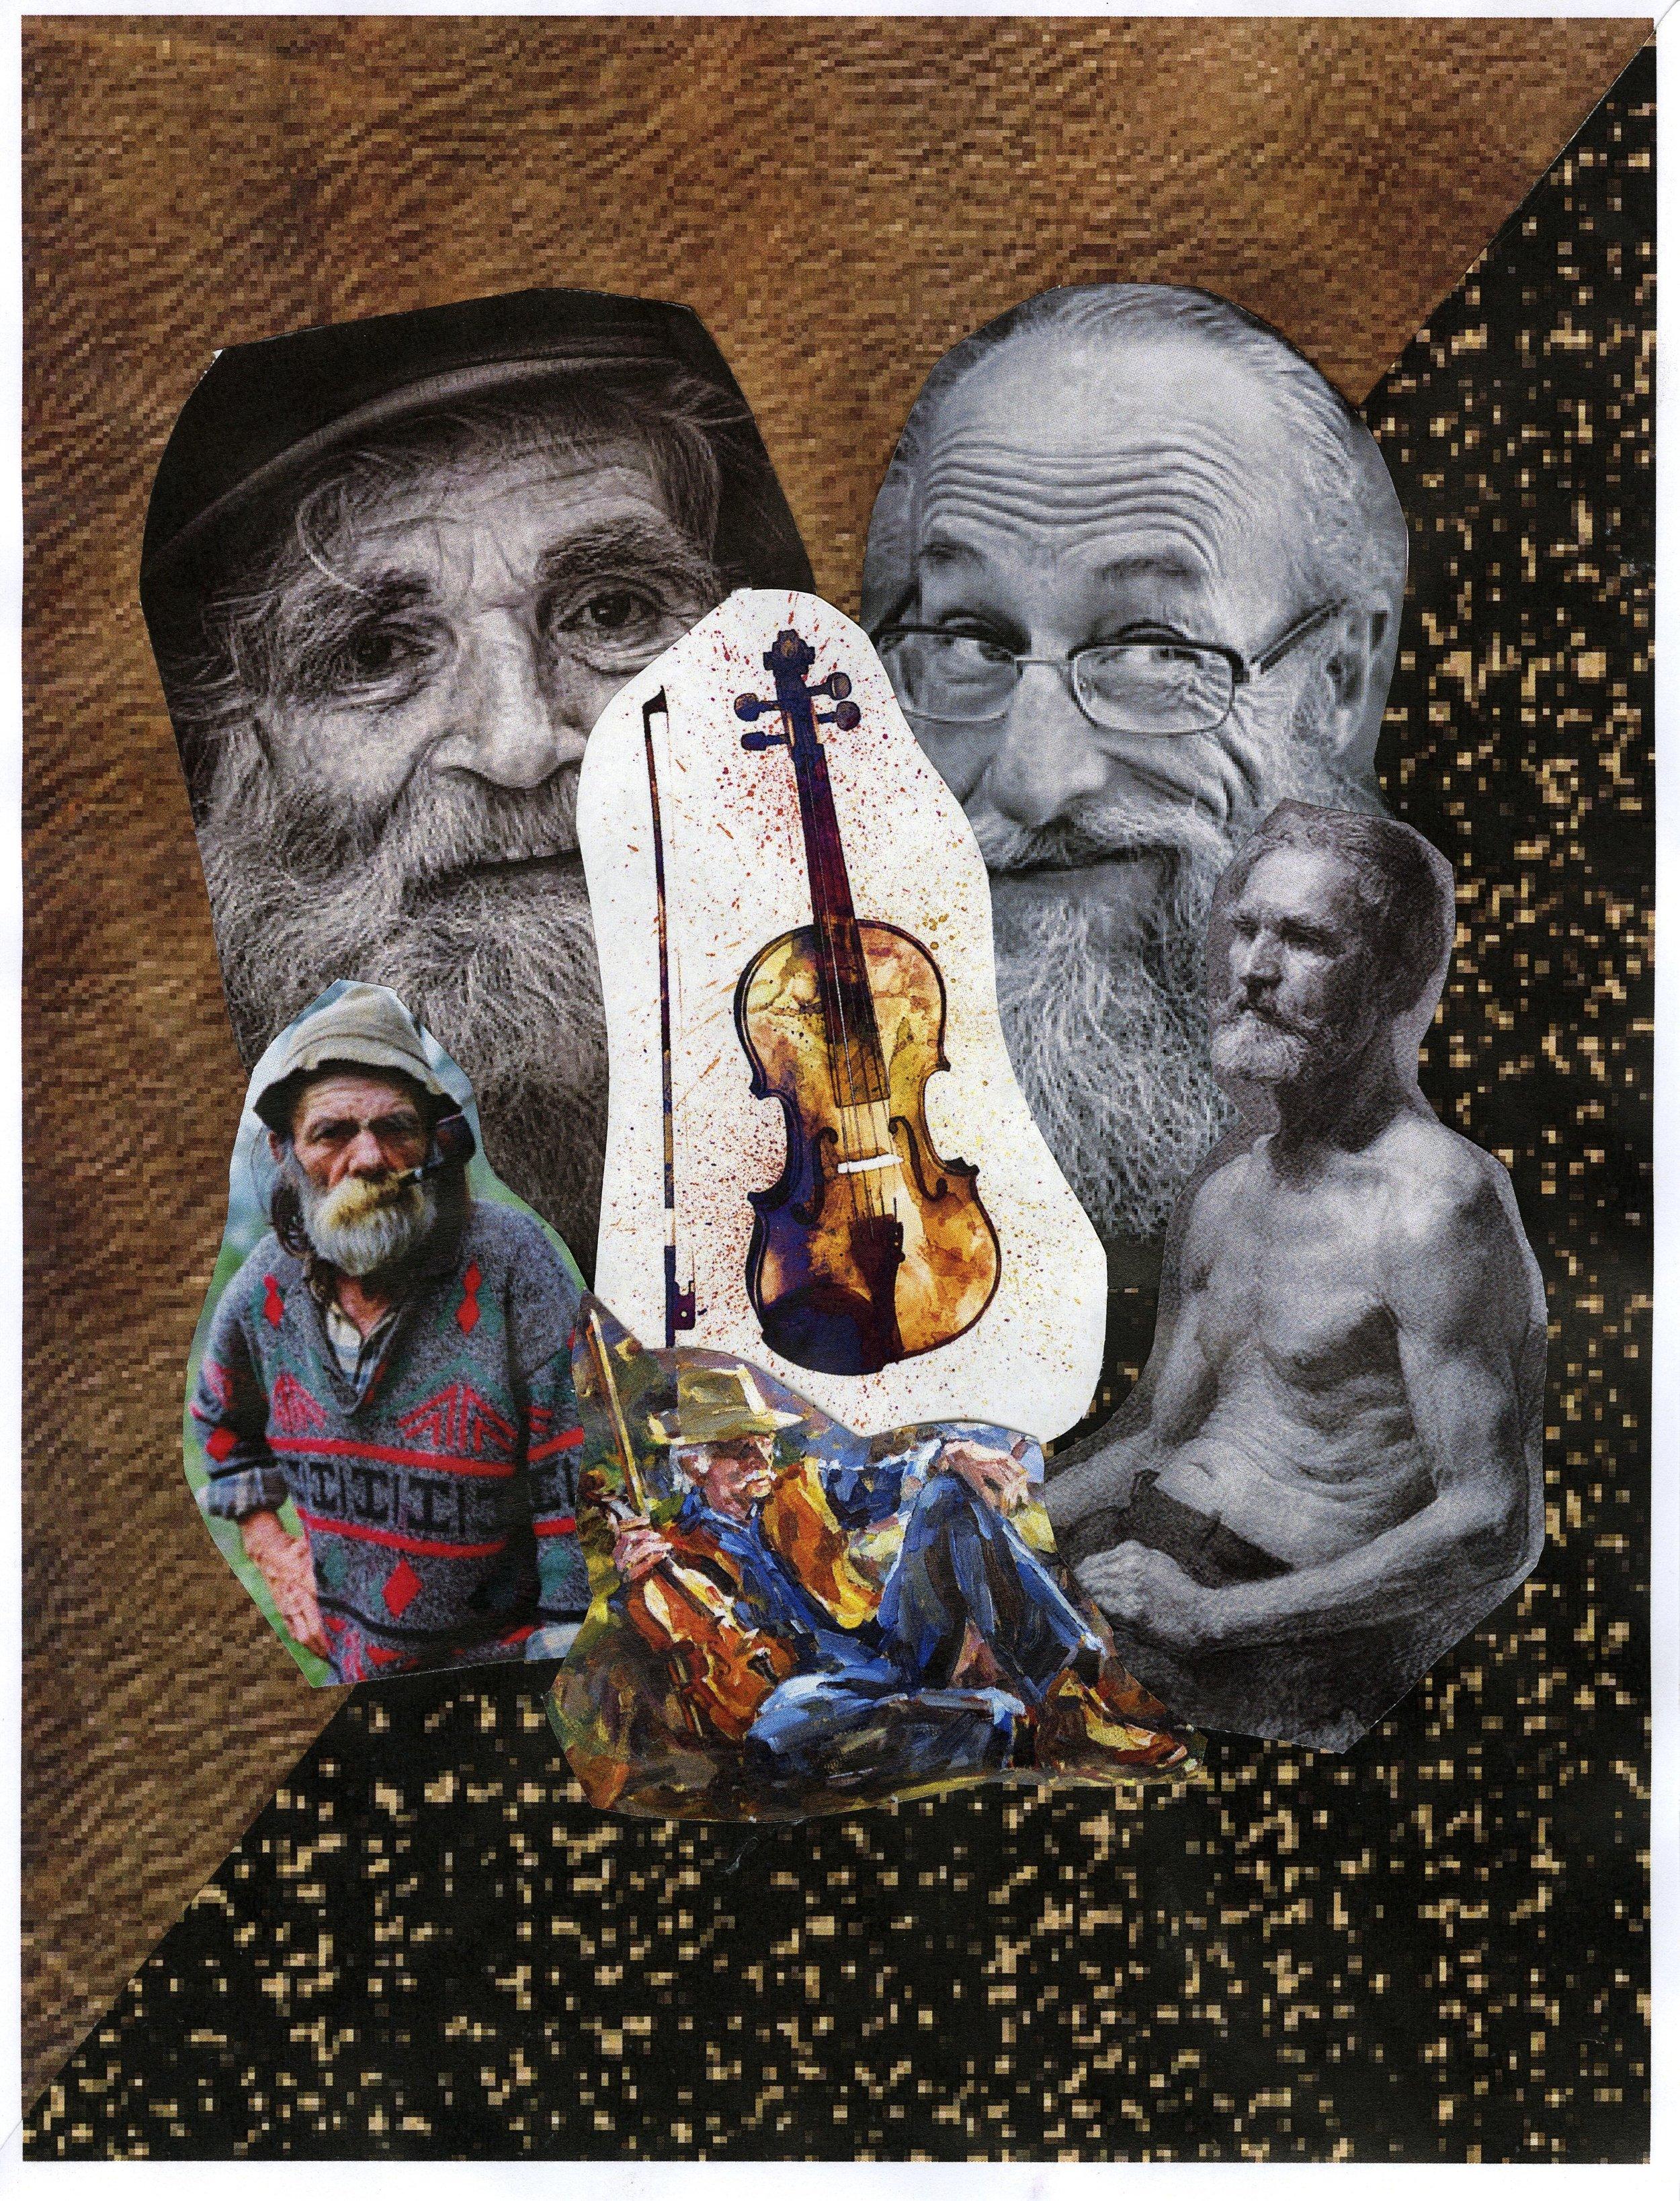 The Fiddler - inspiration